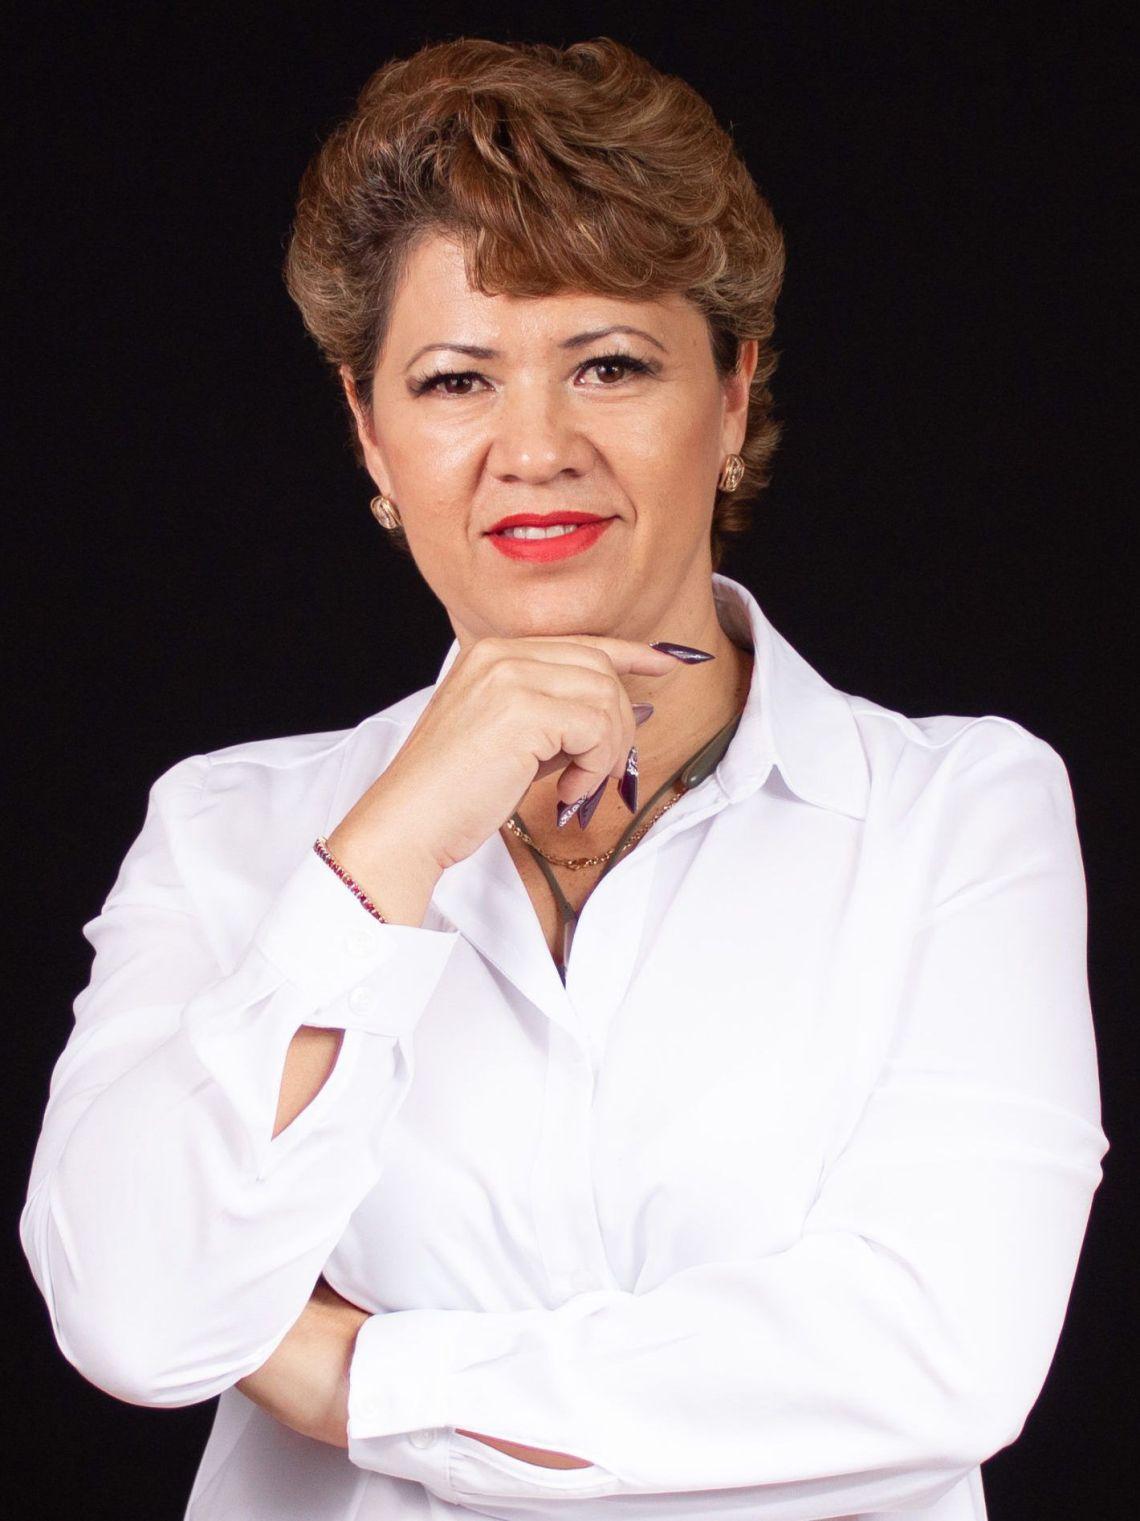 Angelica Osorio